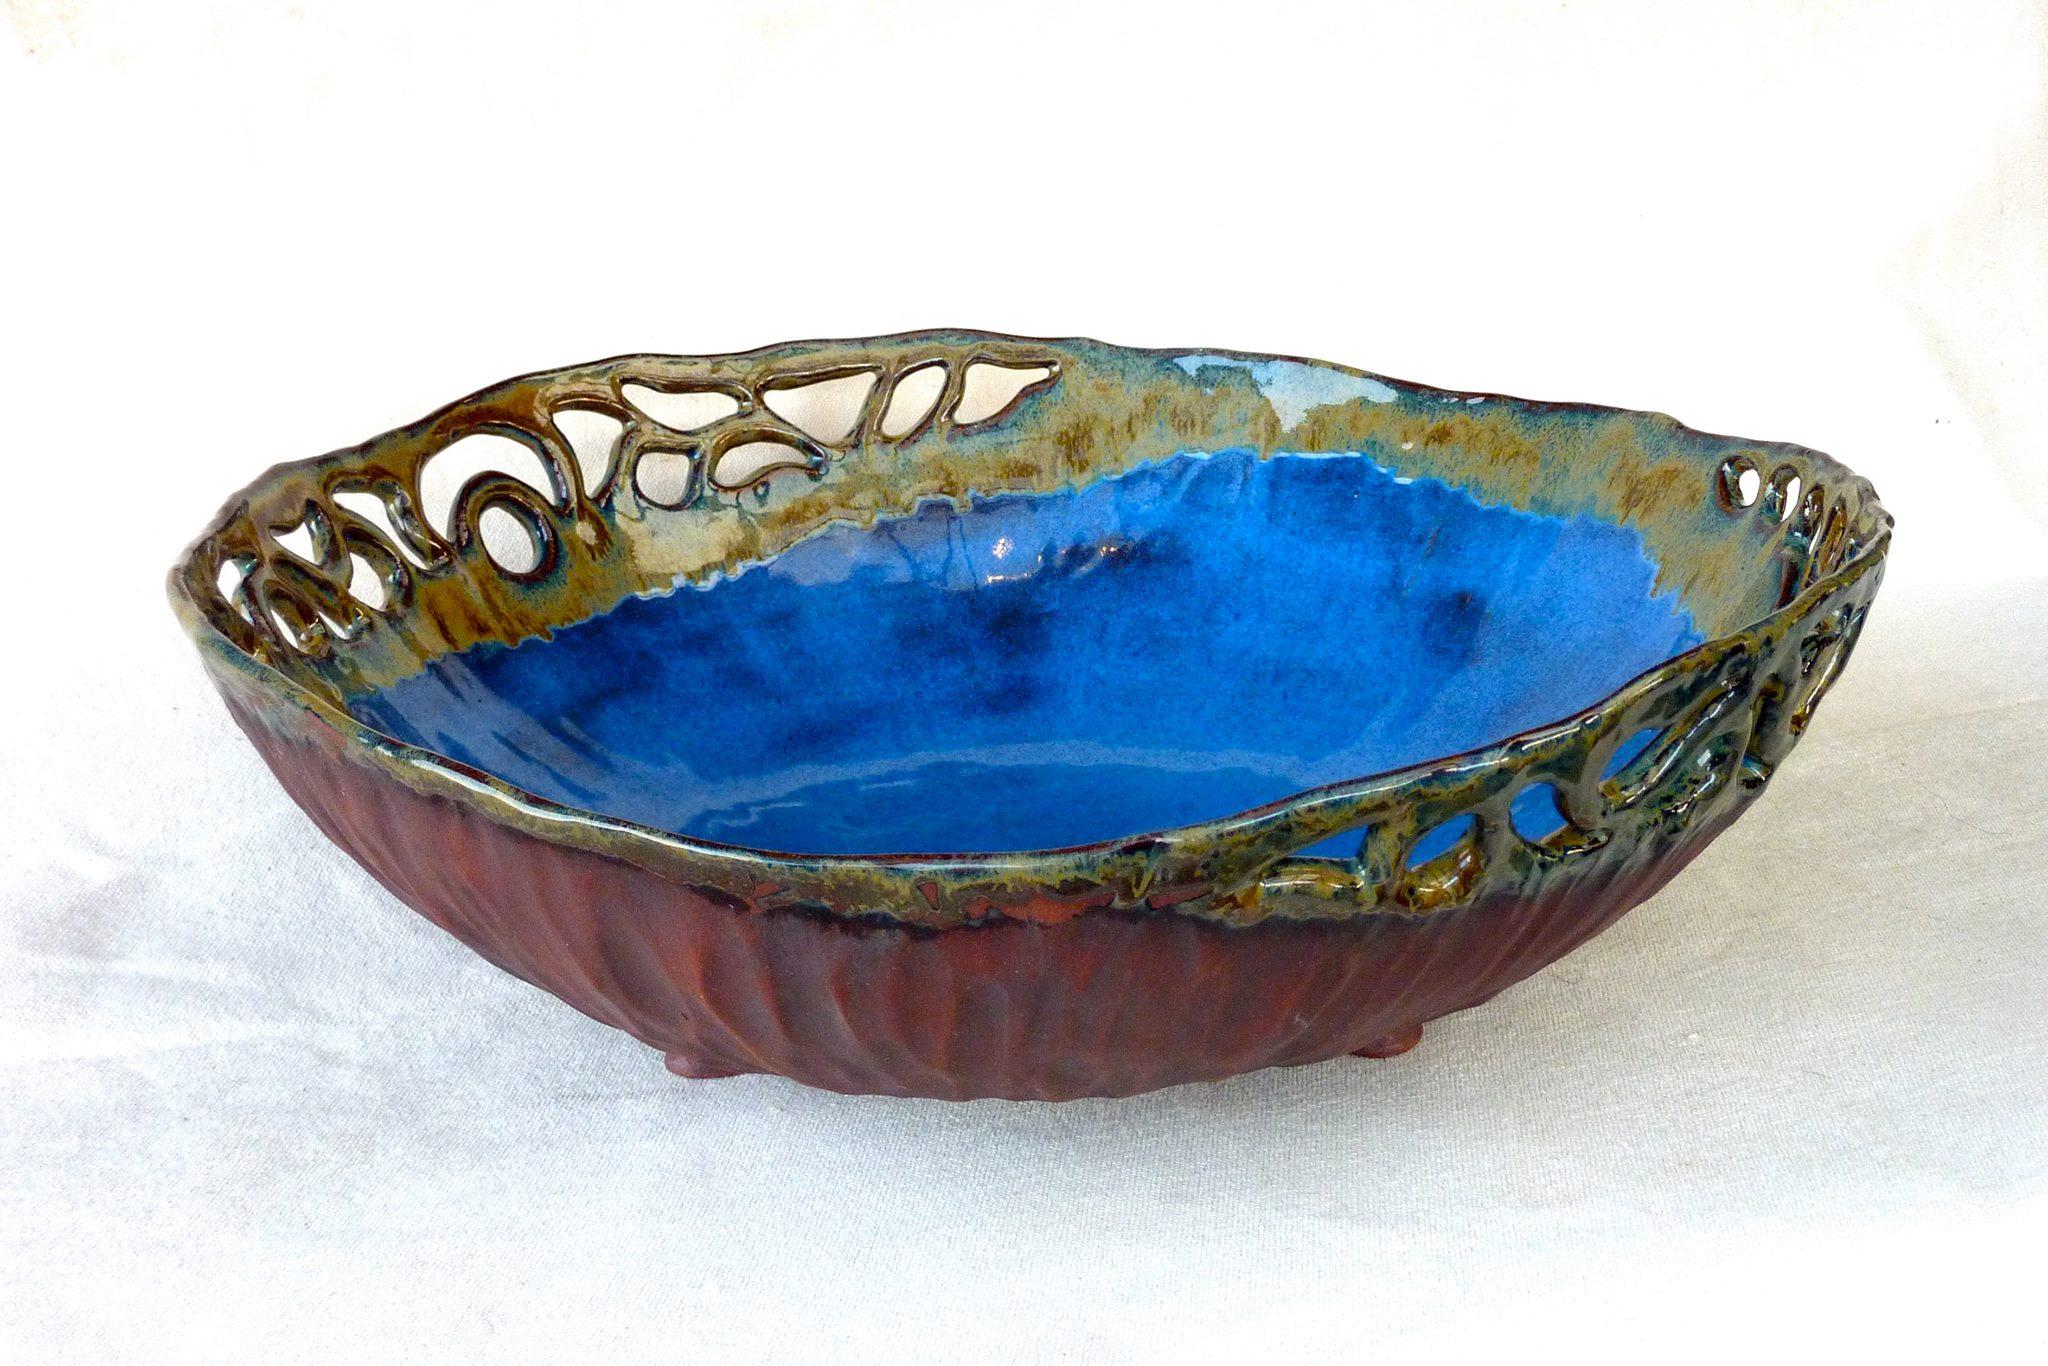 M332 bowl by Louise Bouchard